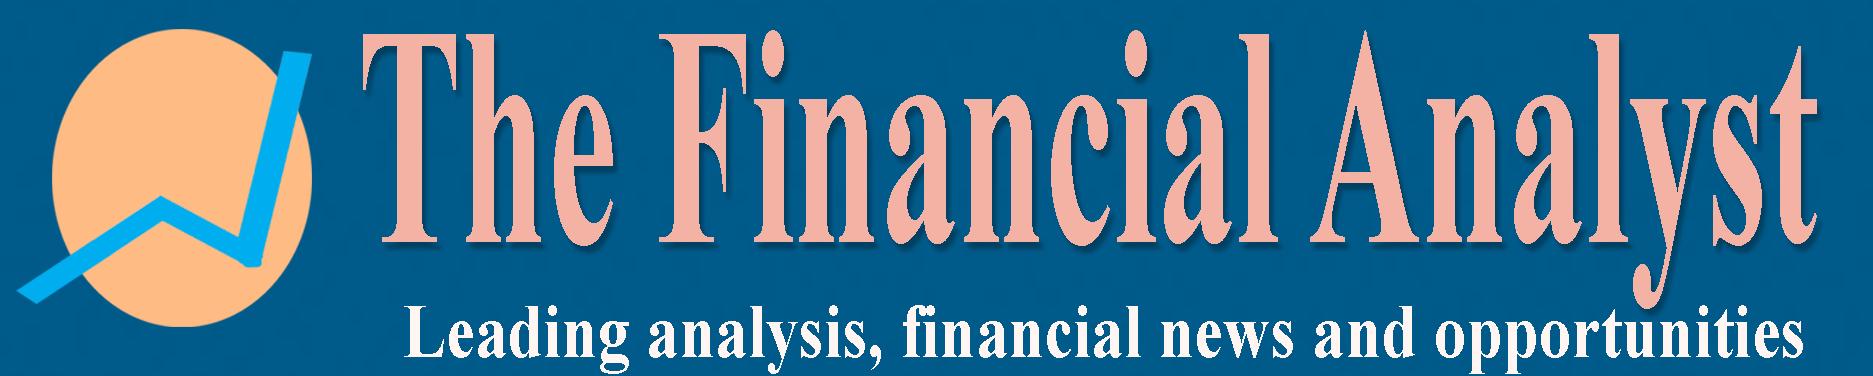 TheFinancialAnalyst.net